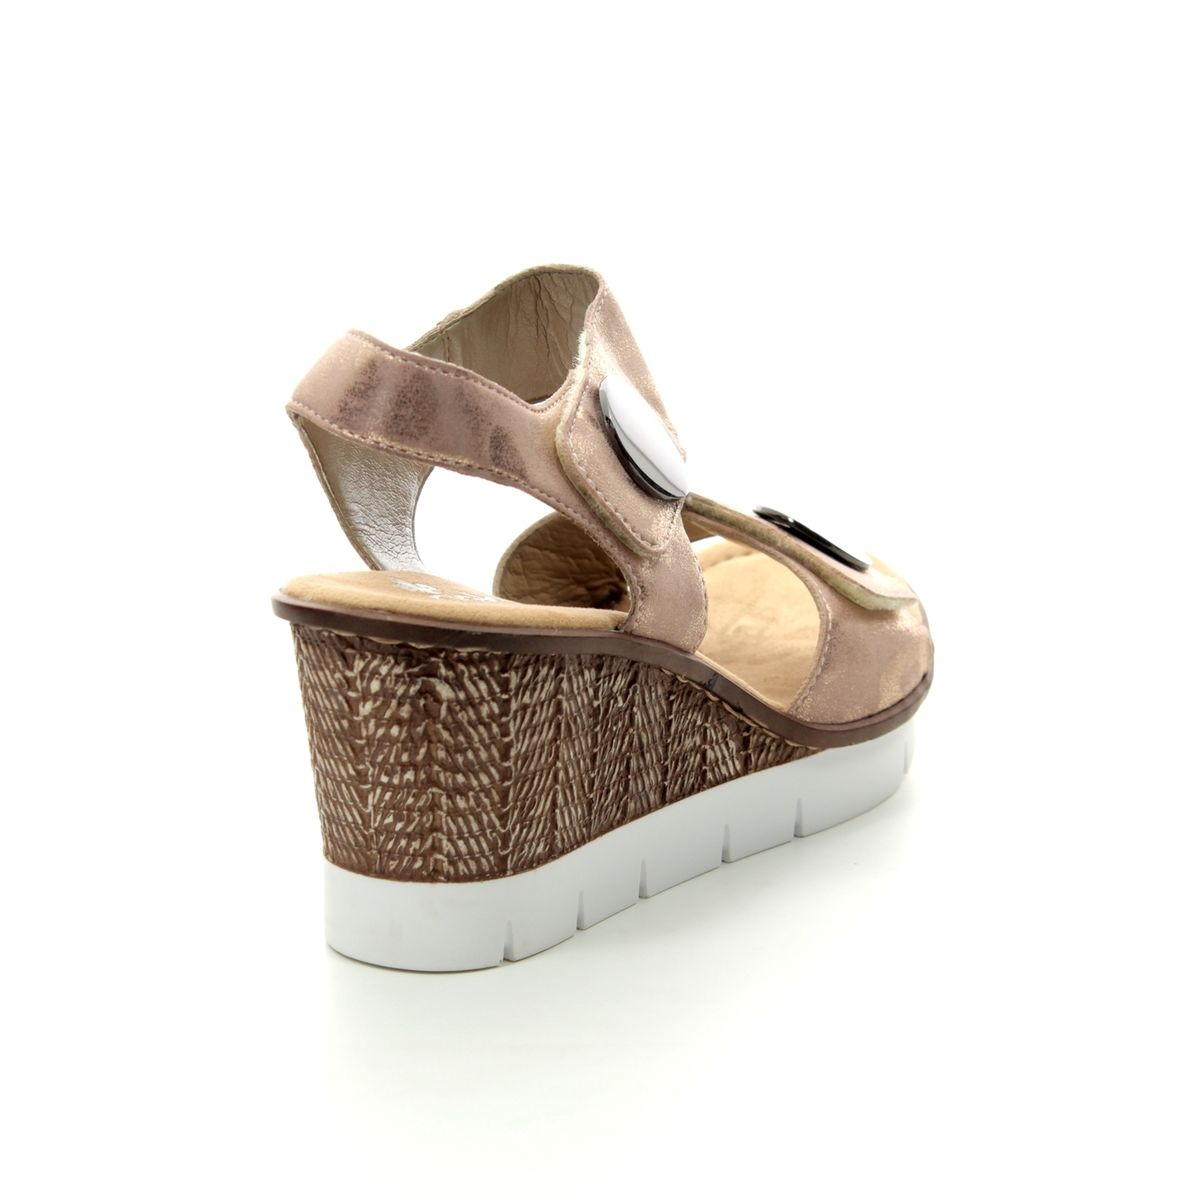 58e73ff2000 Rieker Wedge Sandals - ROSE - 65569-31 ALTON